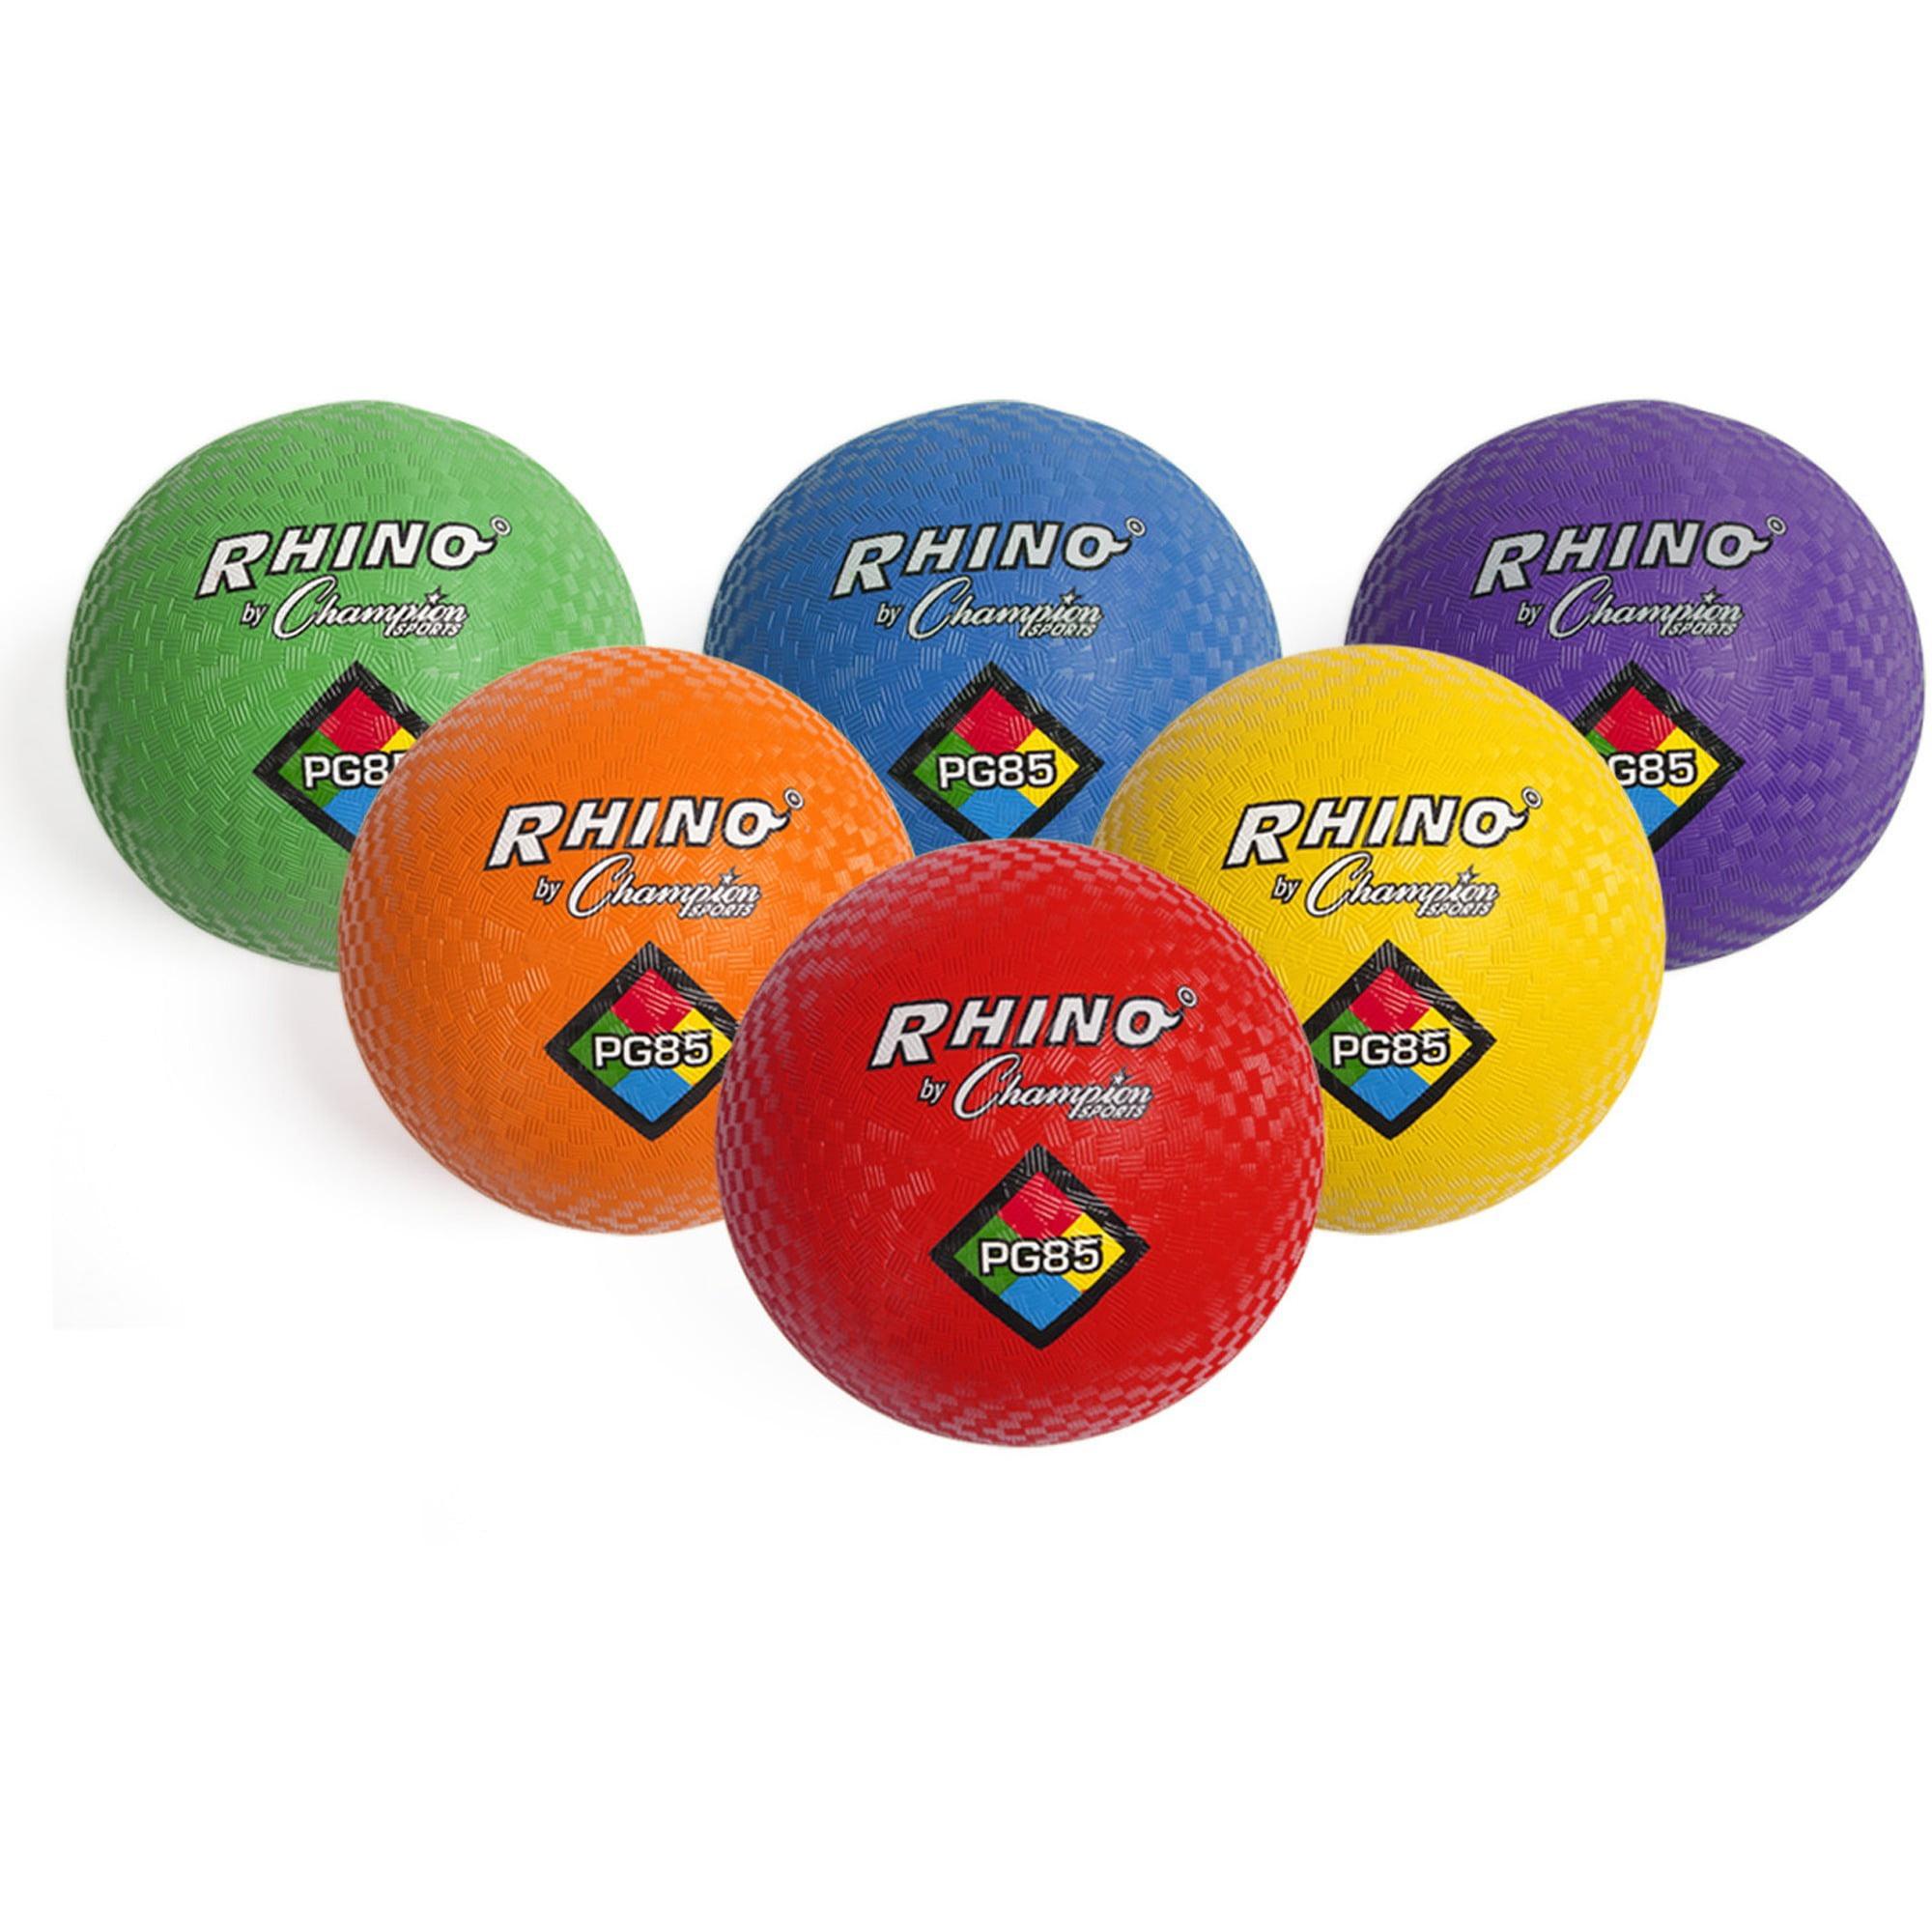 Champion Sport, CSIPGSET, s Playground Ball Set, 6, Assorted,Red,Yellow,Green,Orange,Purple